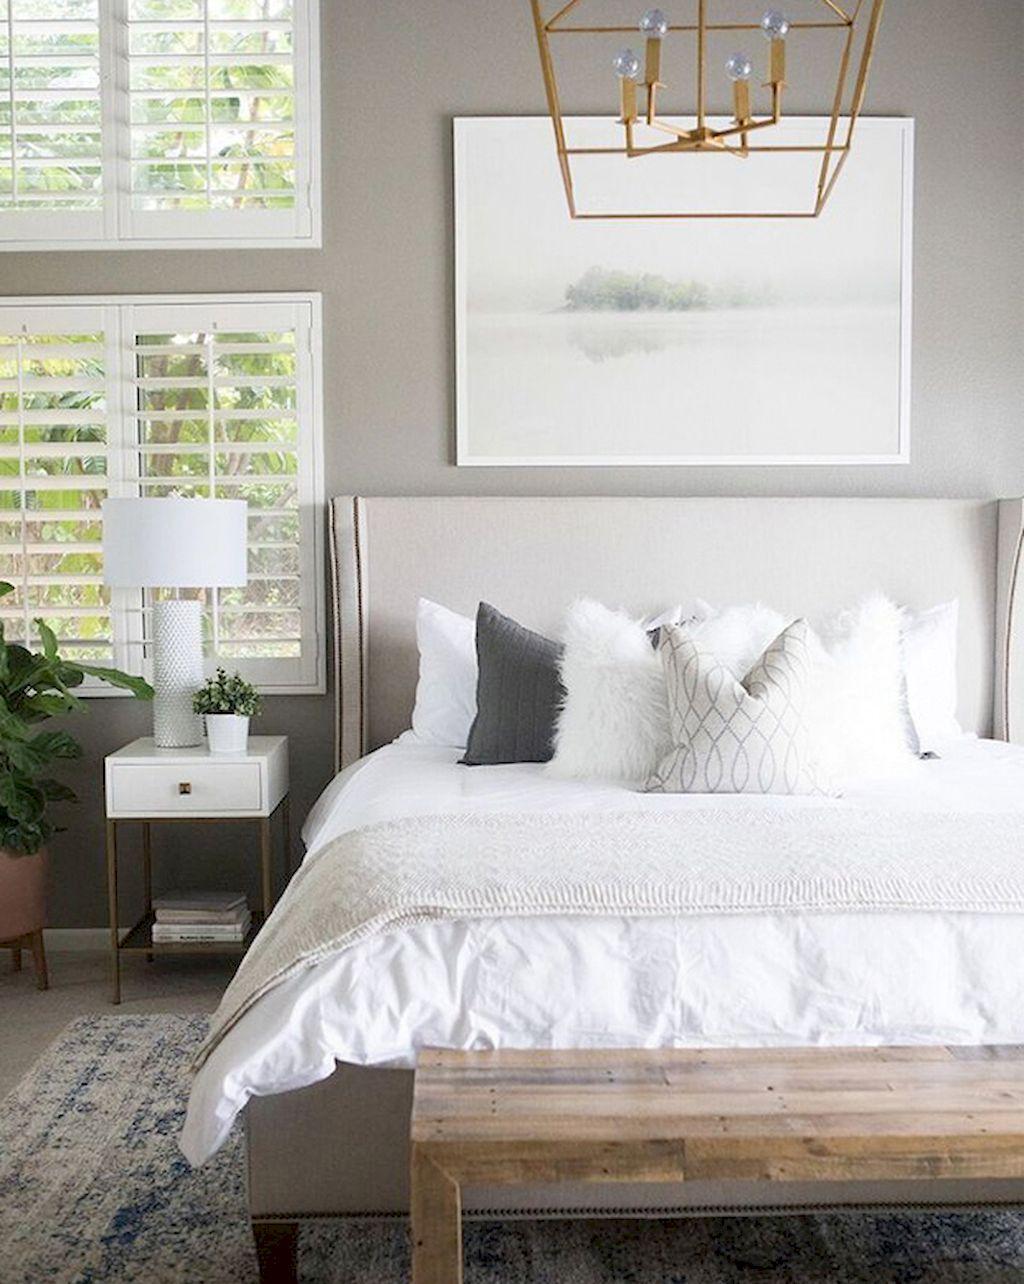 75 Small Master Bedroom Decorating Ideas Small Master Bedroom Master Bedrooms Decor Bedroom Rug Placement